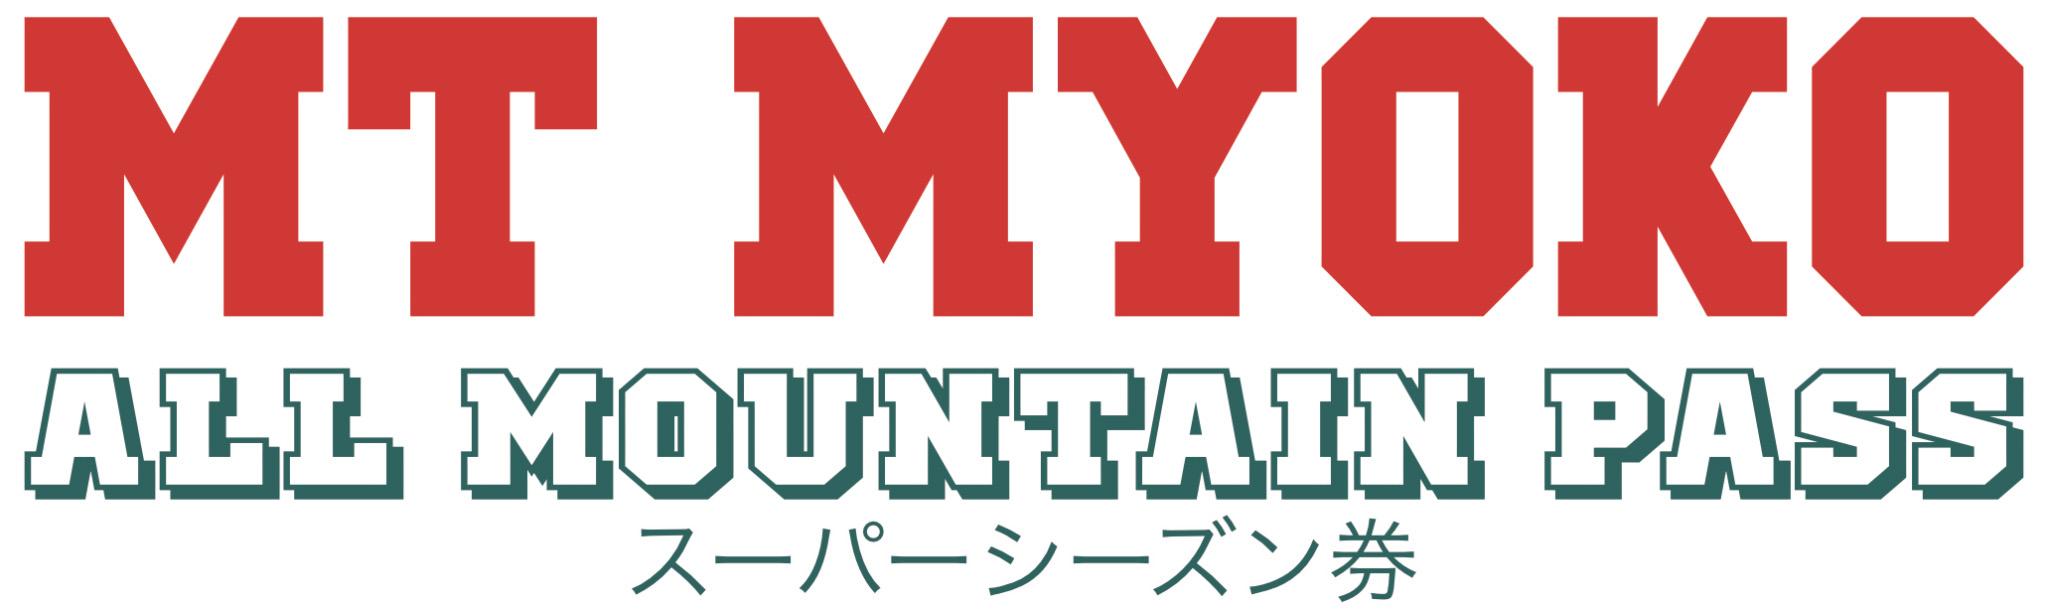 Mt-Myoko-All-Mountain-Pass-2048x610